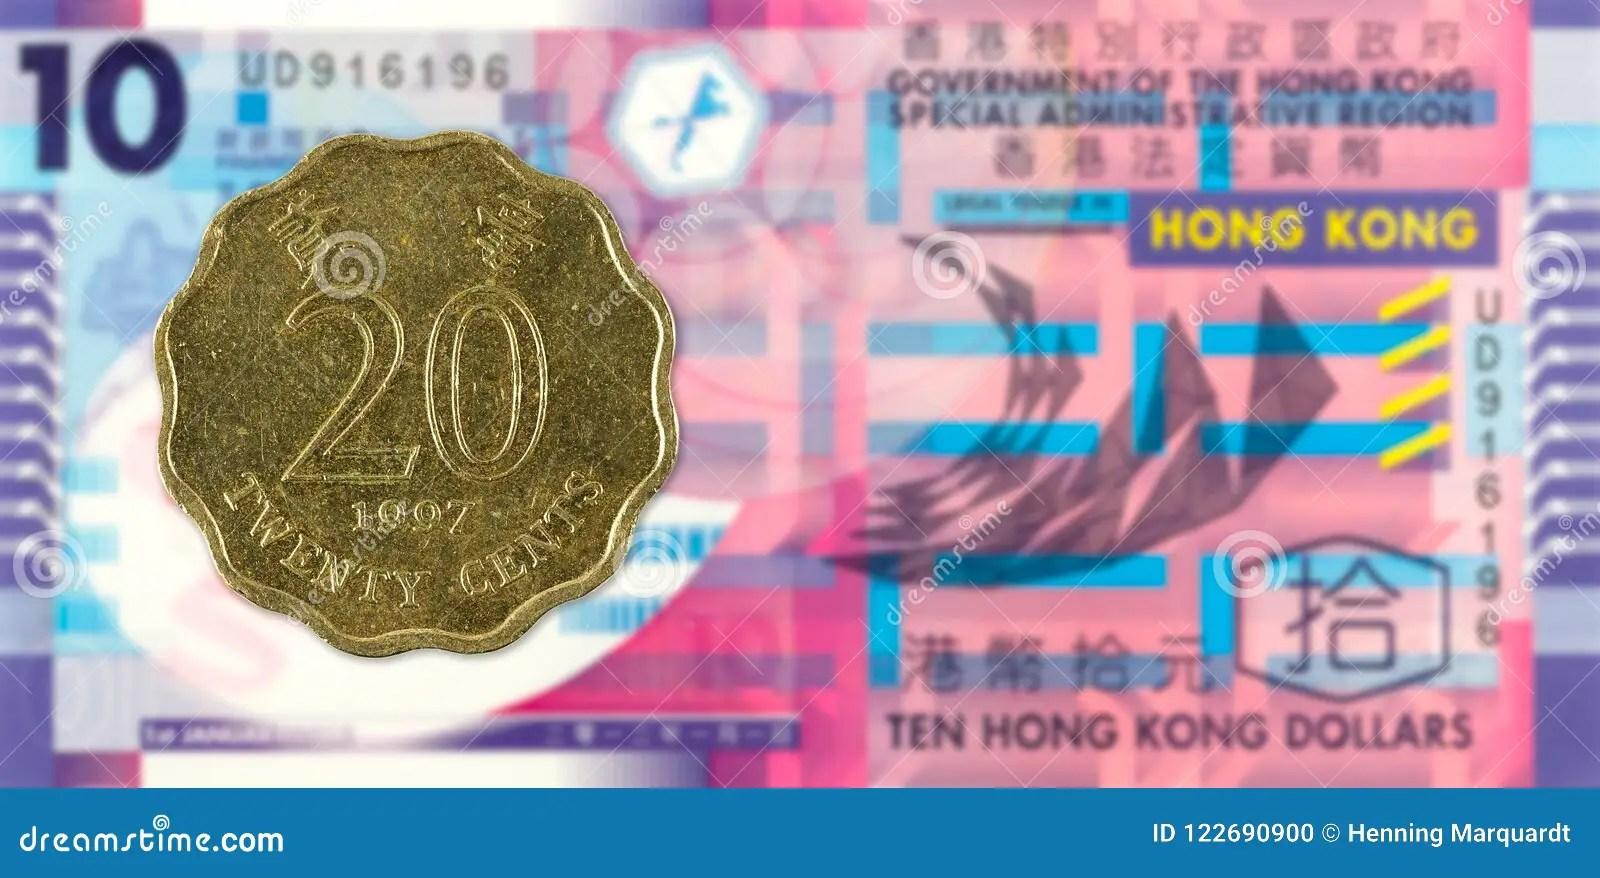 20 Hong Kong Cent Coin 1997 Against 10 Hong Kong Dollar Note Stock Photo - Image of against. image: 122690900